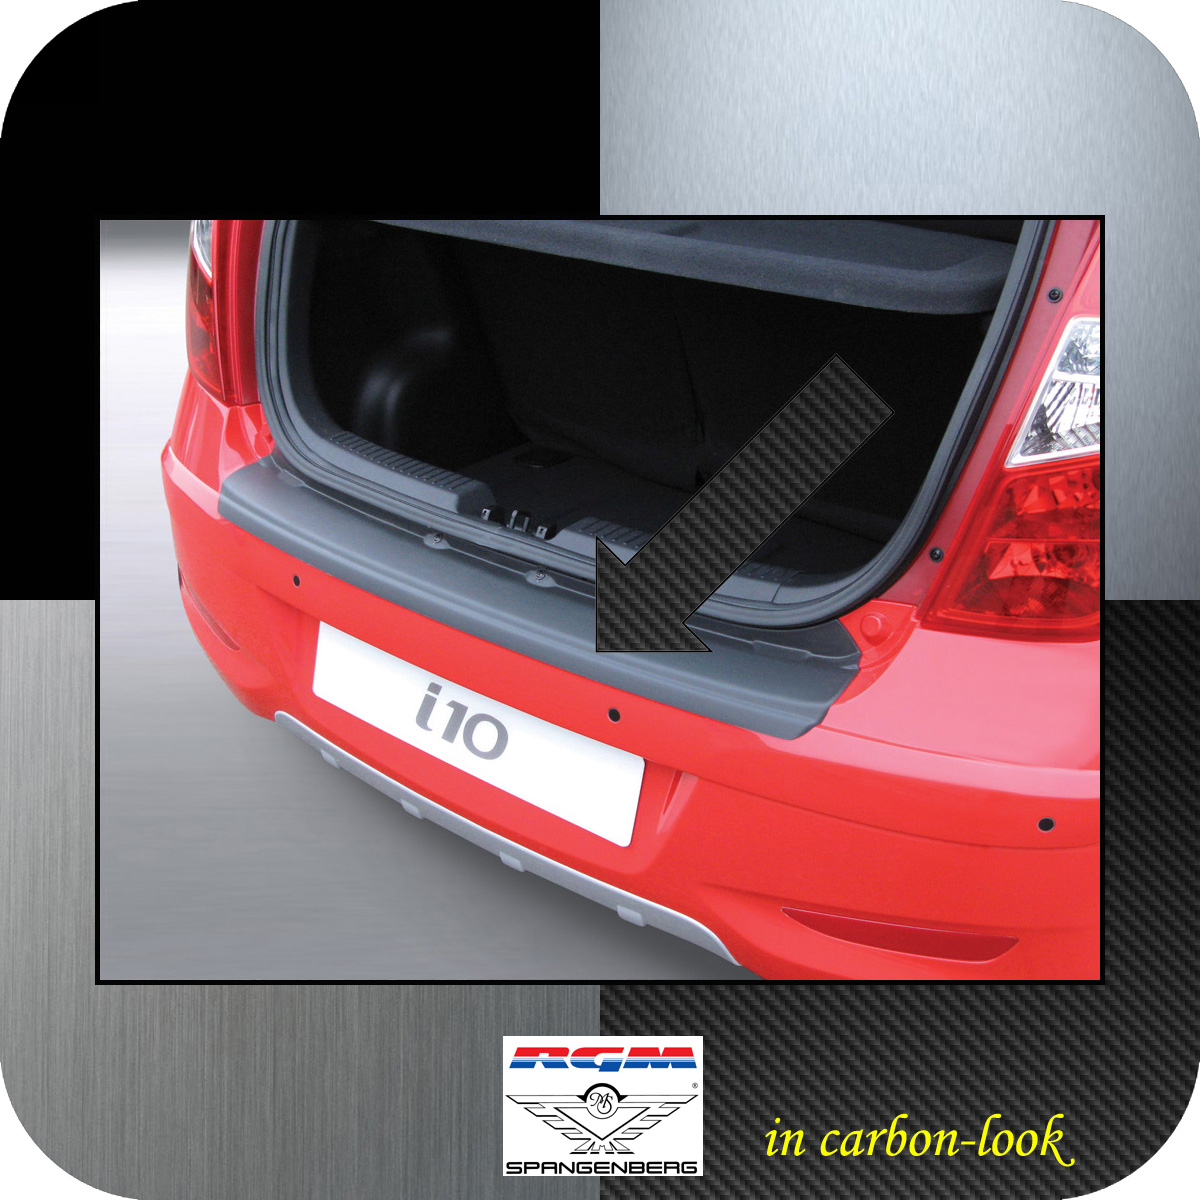 Ladekantenschutz Carbon-Look Hyundai i10 I Schrägheck ab Mopf 2011-2013 3509497